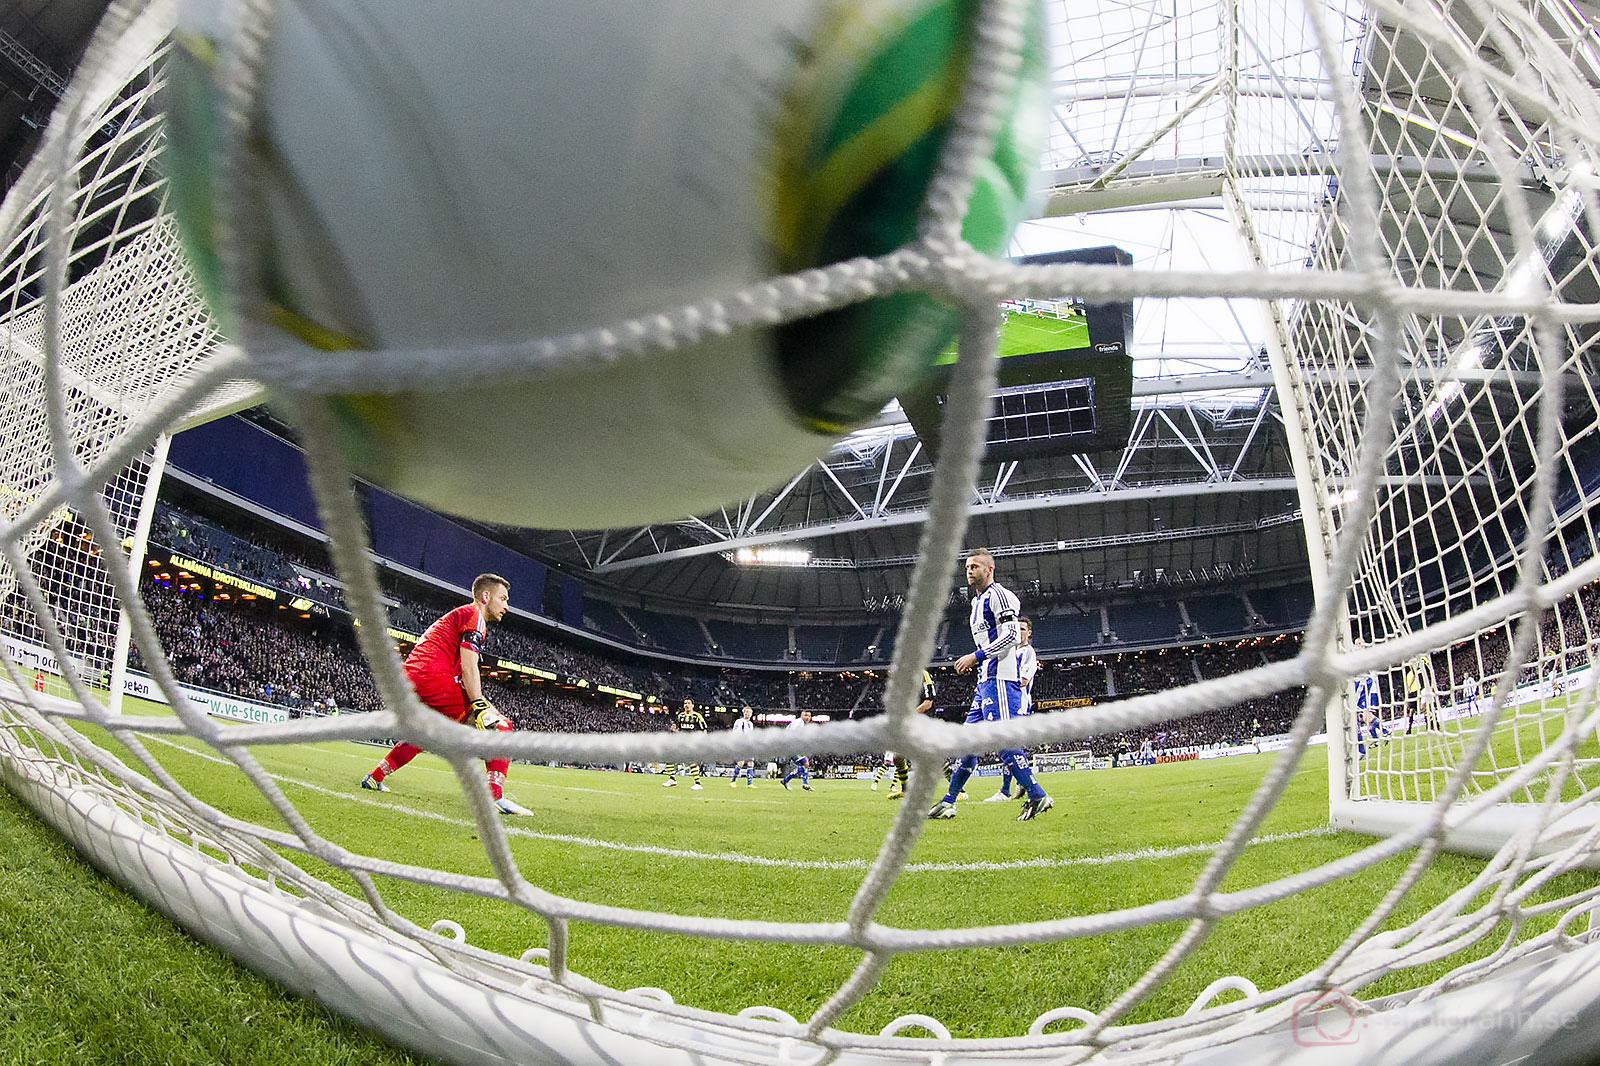 Mål av AIK Kennedy Igboananike bakom IFK Göteborgs målvakt John Alvbåge